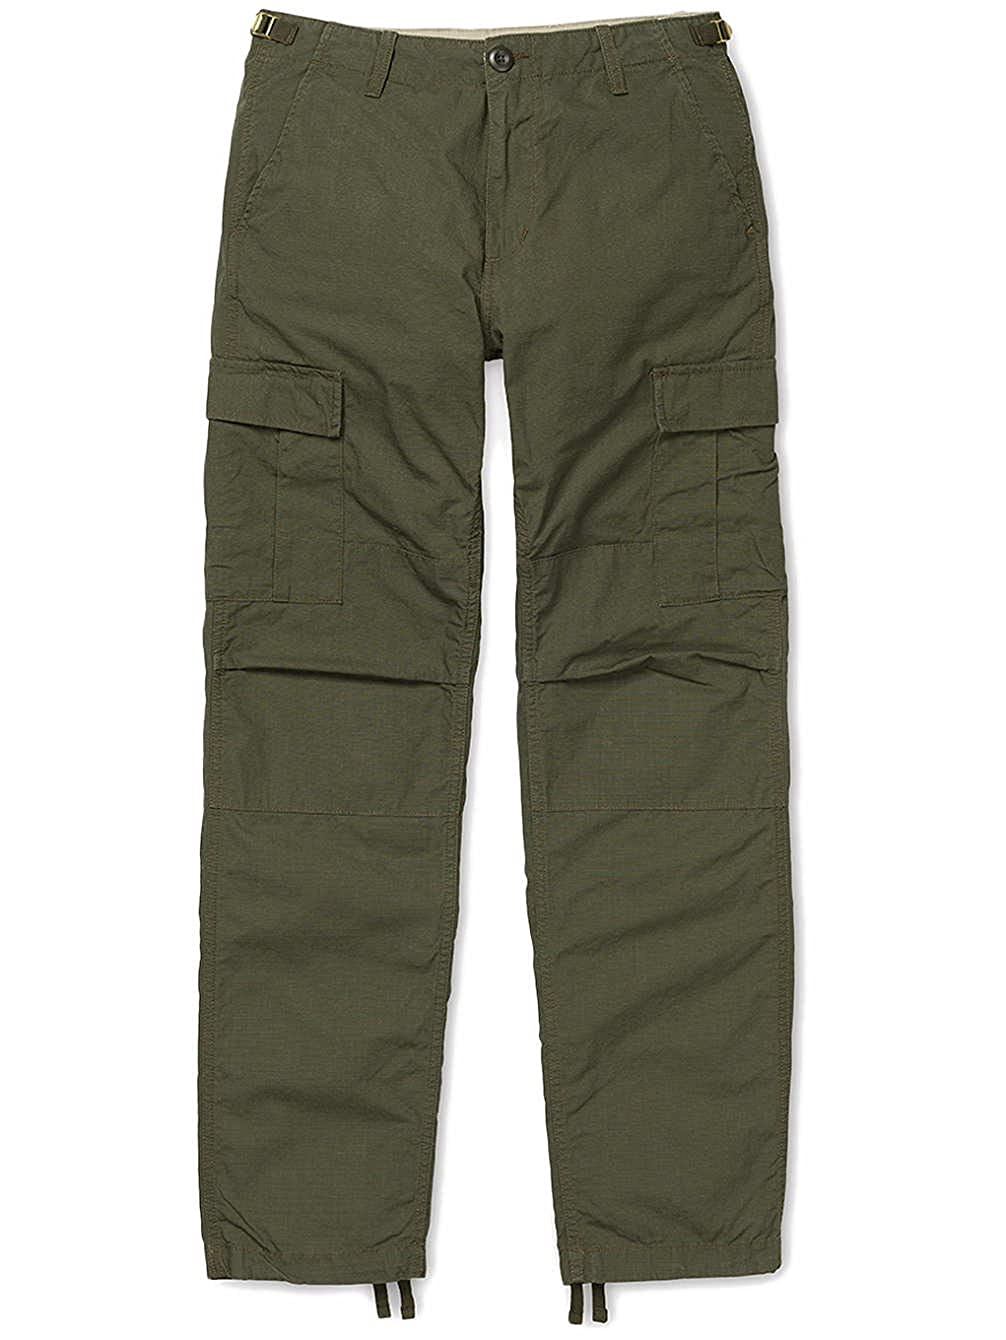 Aviation Carhartt HommeVêtements Pant Pantalon Et CrxBeWQdo